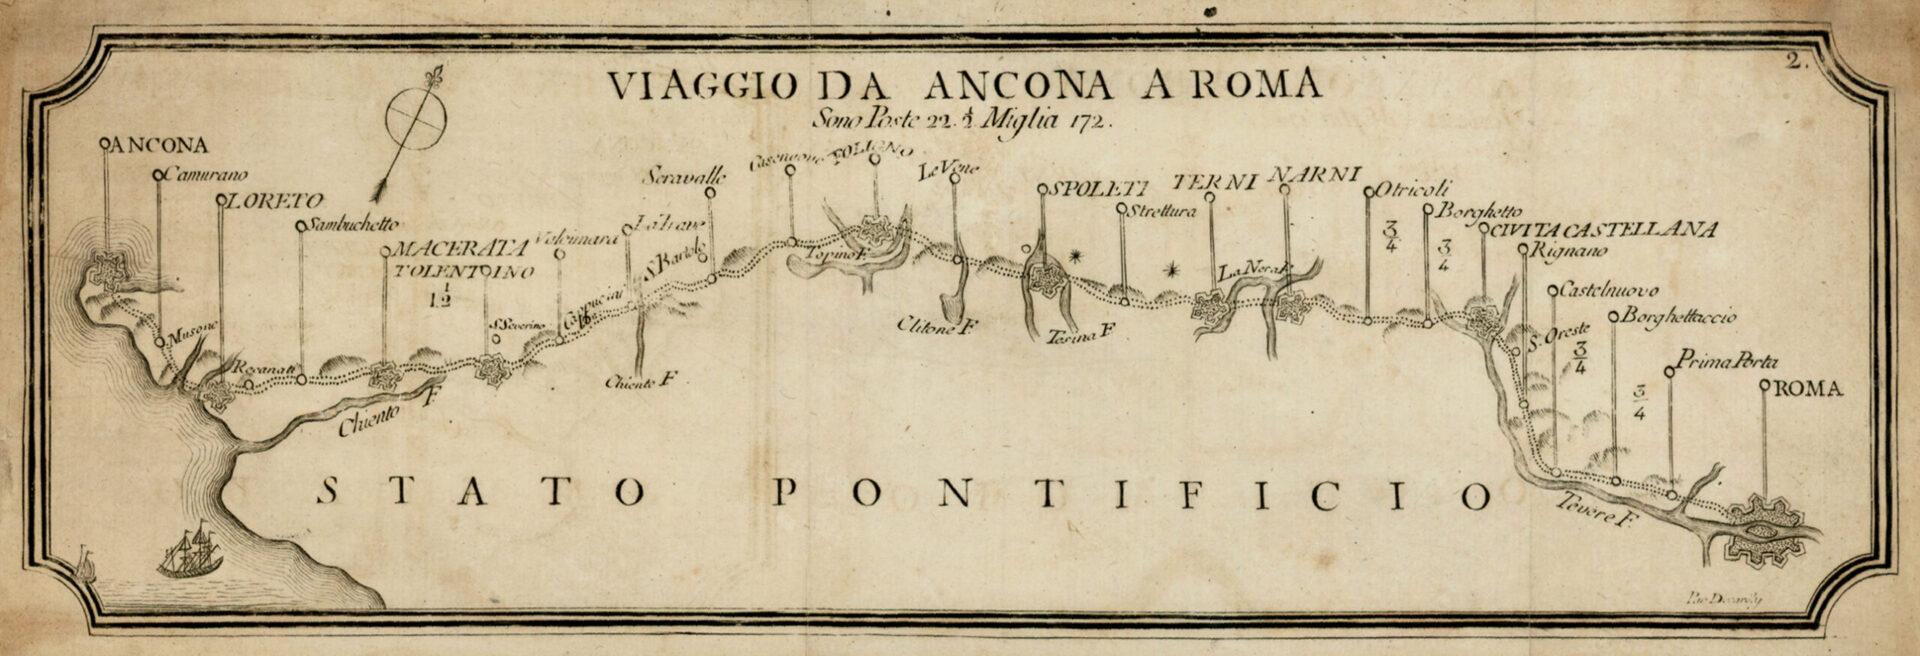 F. De Caroly, Viaggio da Ancona a Roma (1786).